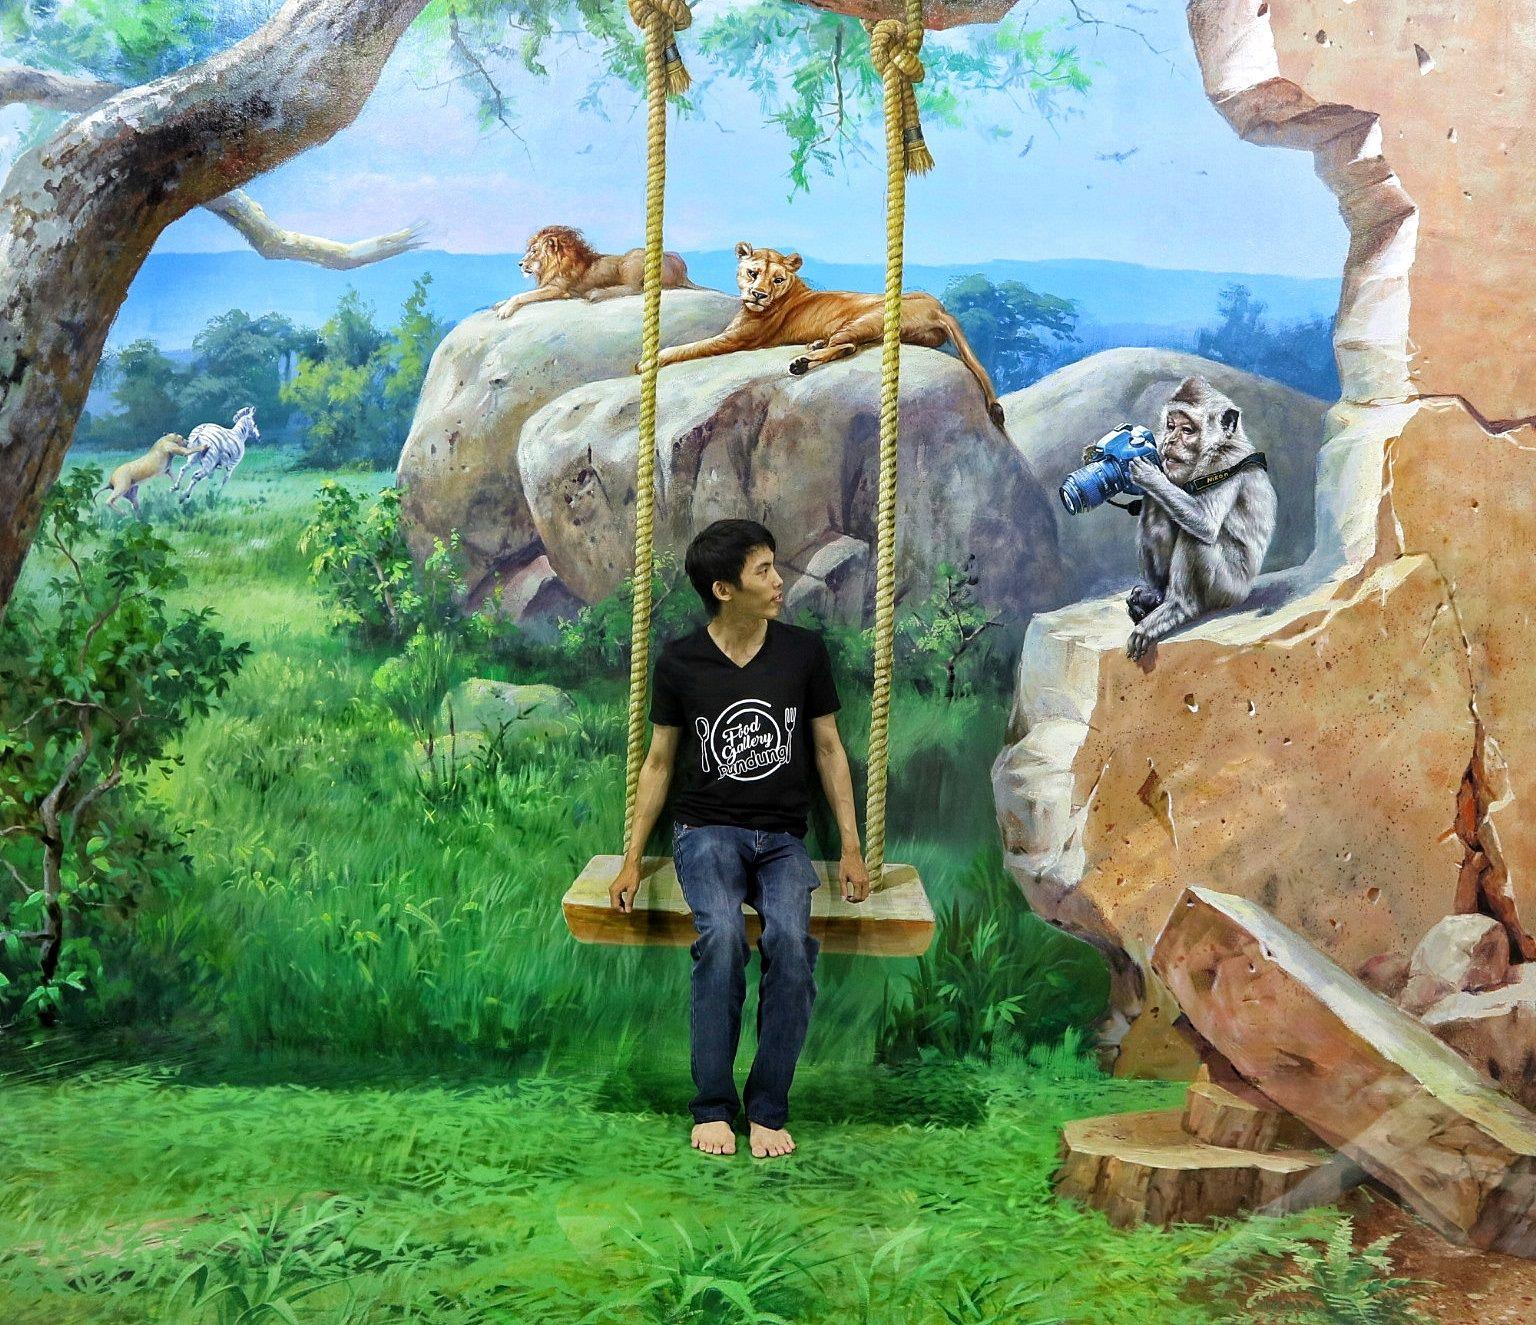 Wow Selfie Kekinian 3d Art World Bandung Rajatourbandung Musium Kota